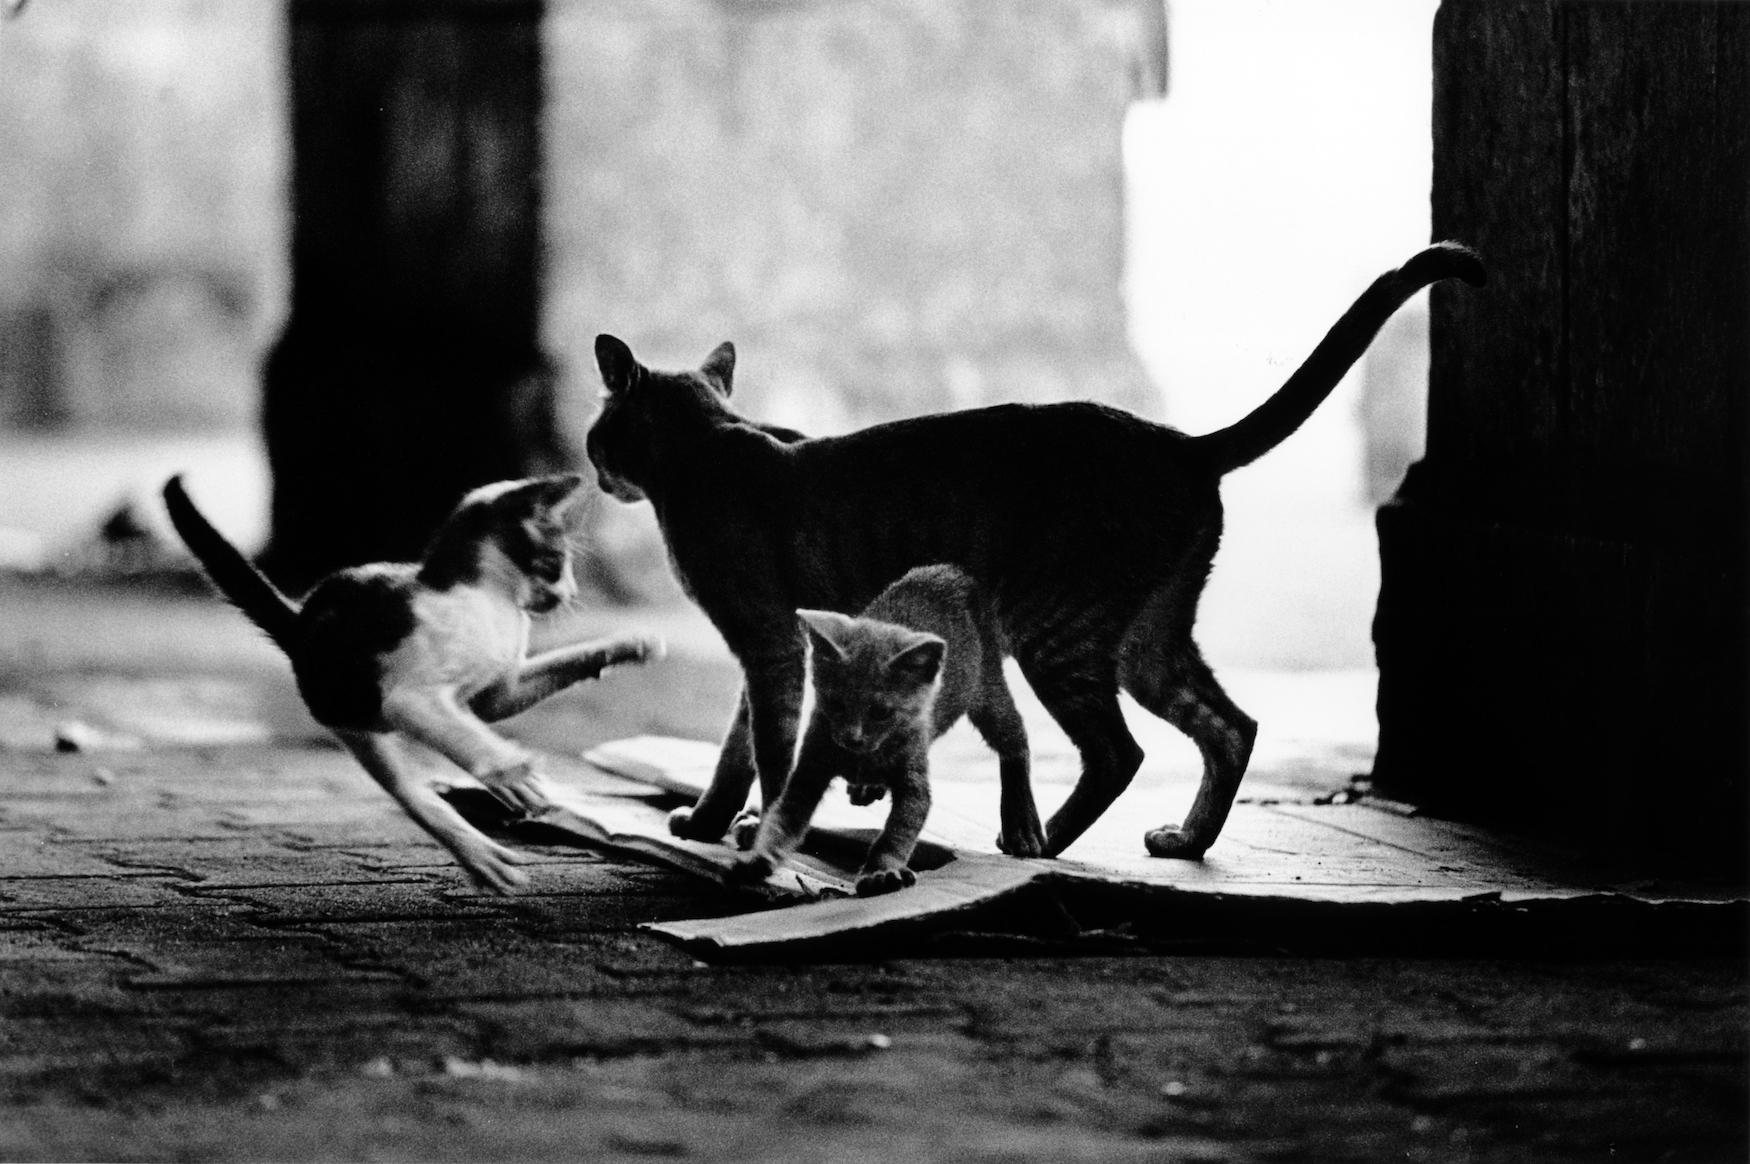 walter_rothwell_photography_cats-023.jpg